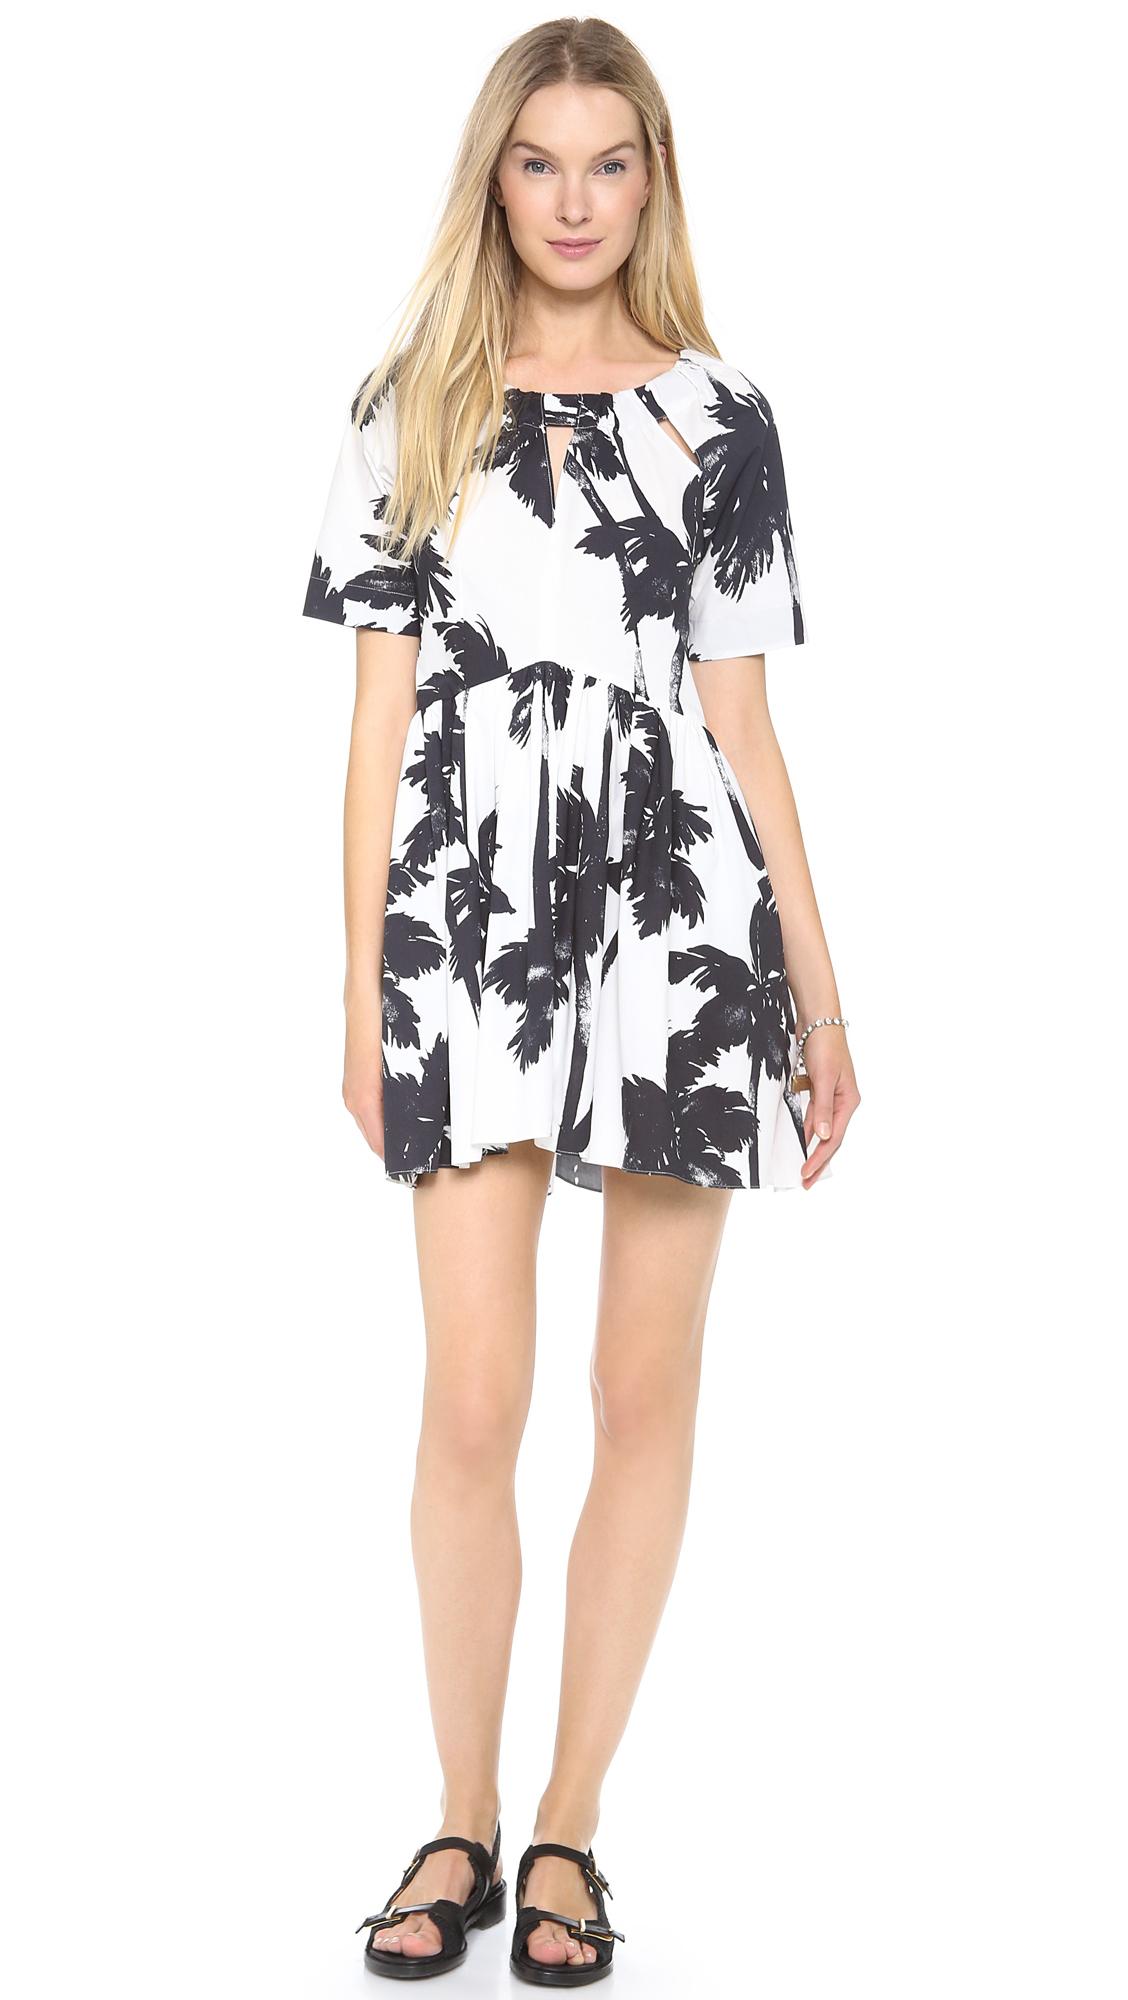 Moschino Cheap And Chic Short Sleeve Dress Whiteblack In